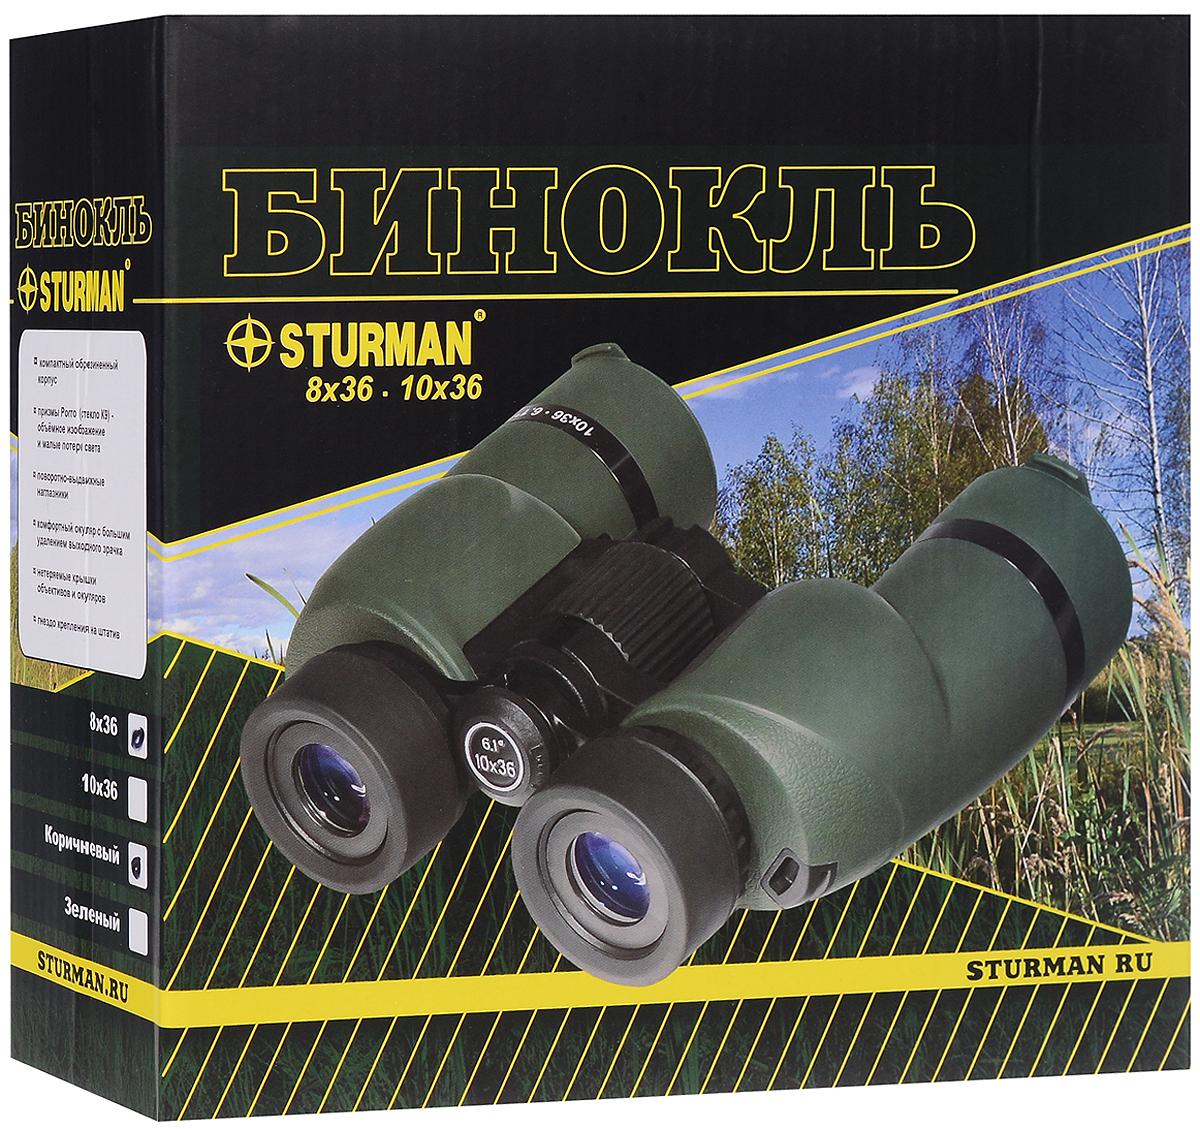 "Бинокль ""Sturman"", цвет: коричневый, увеличение 8х крат, диаметр объектива 36 мм ( 6160 )"